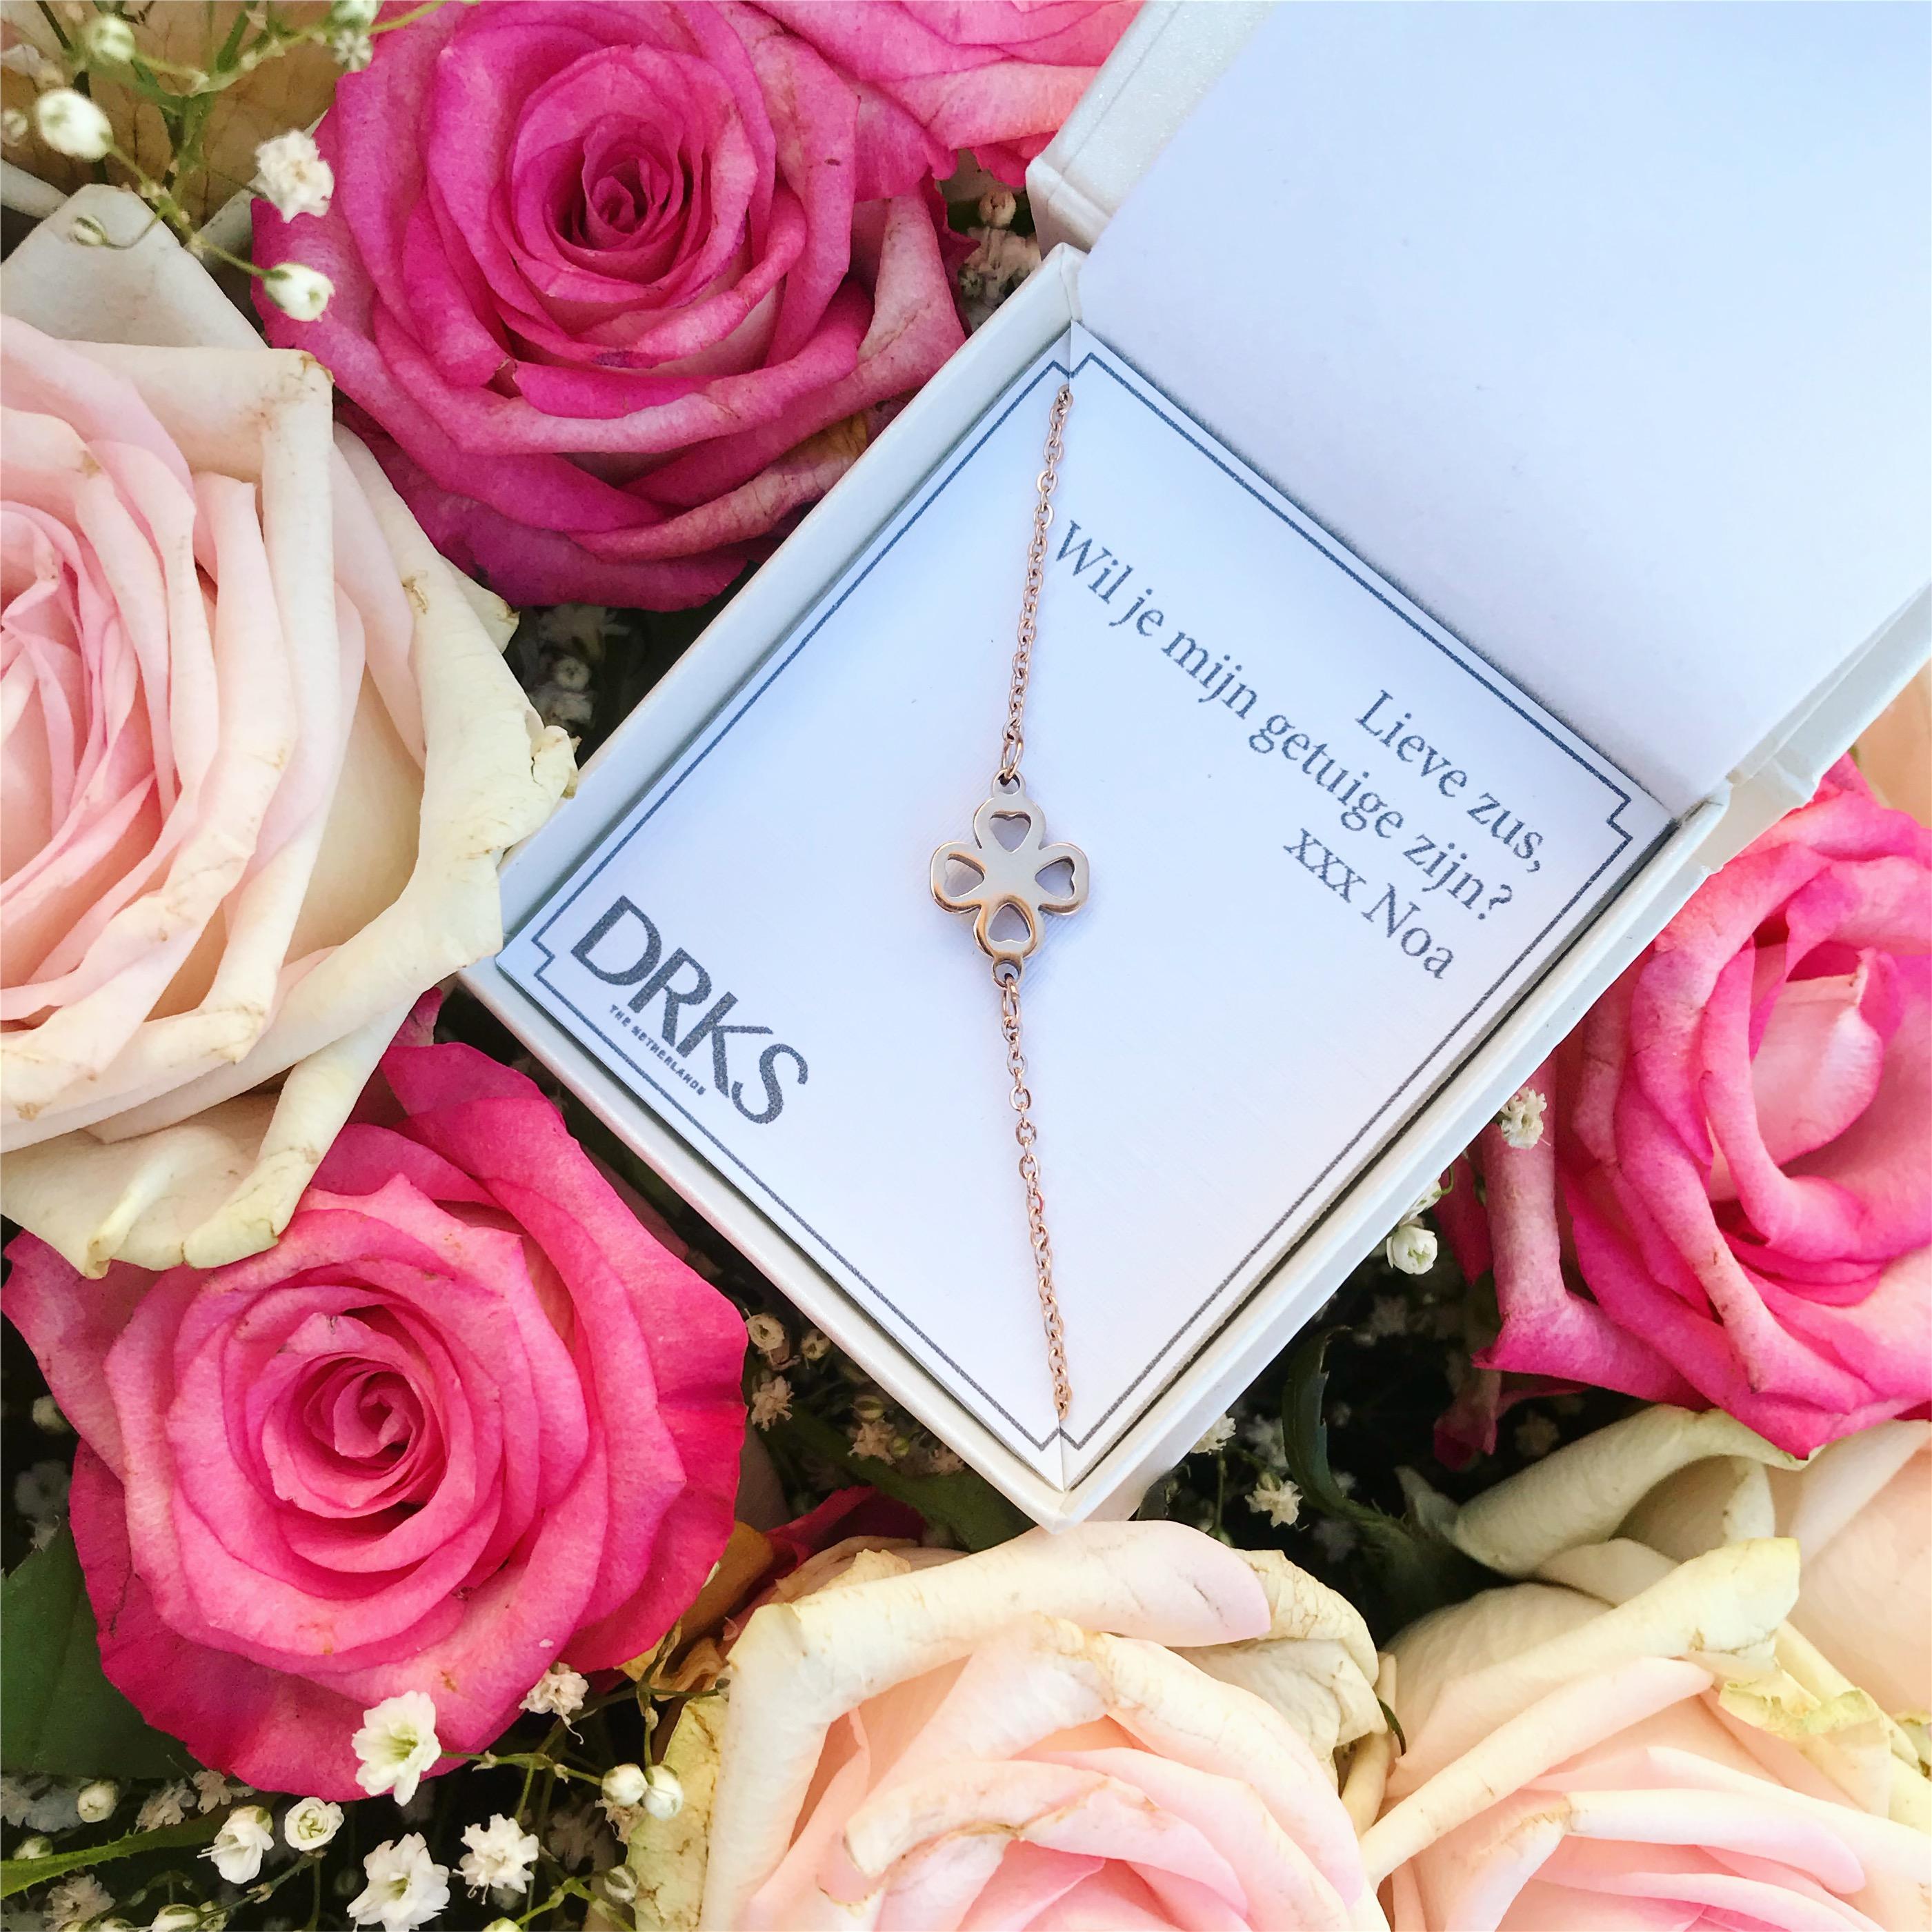 clover armband in rose goud in sieradendoosje